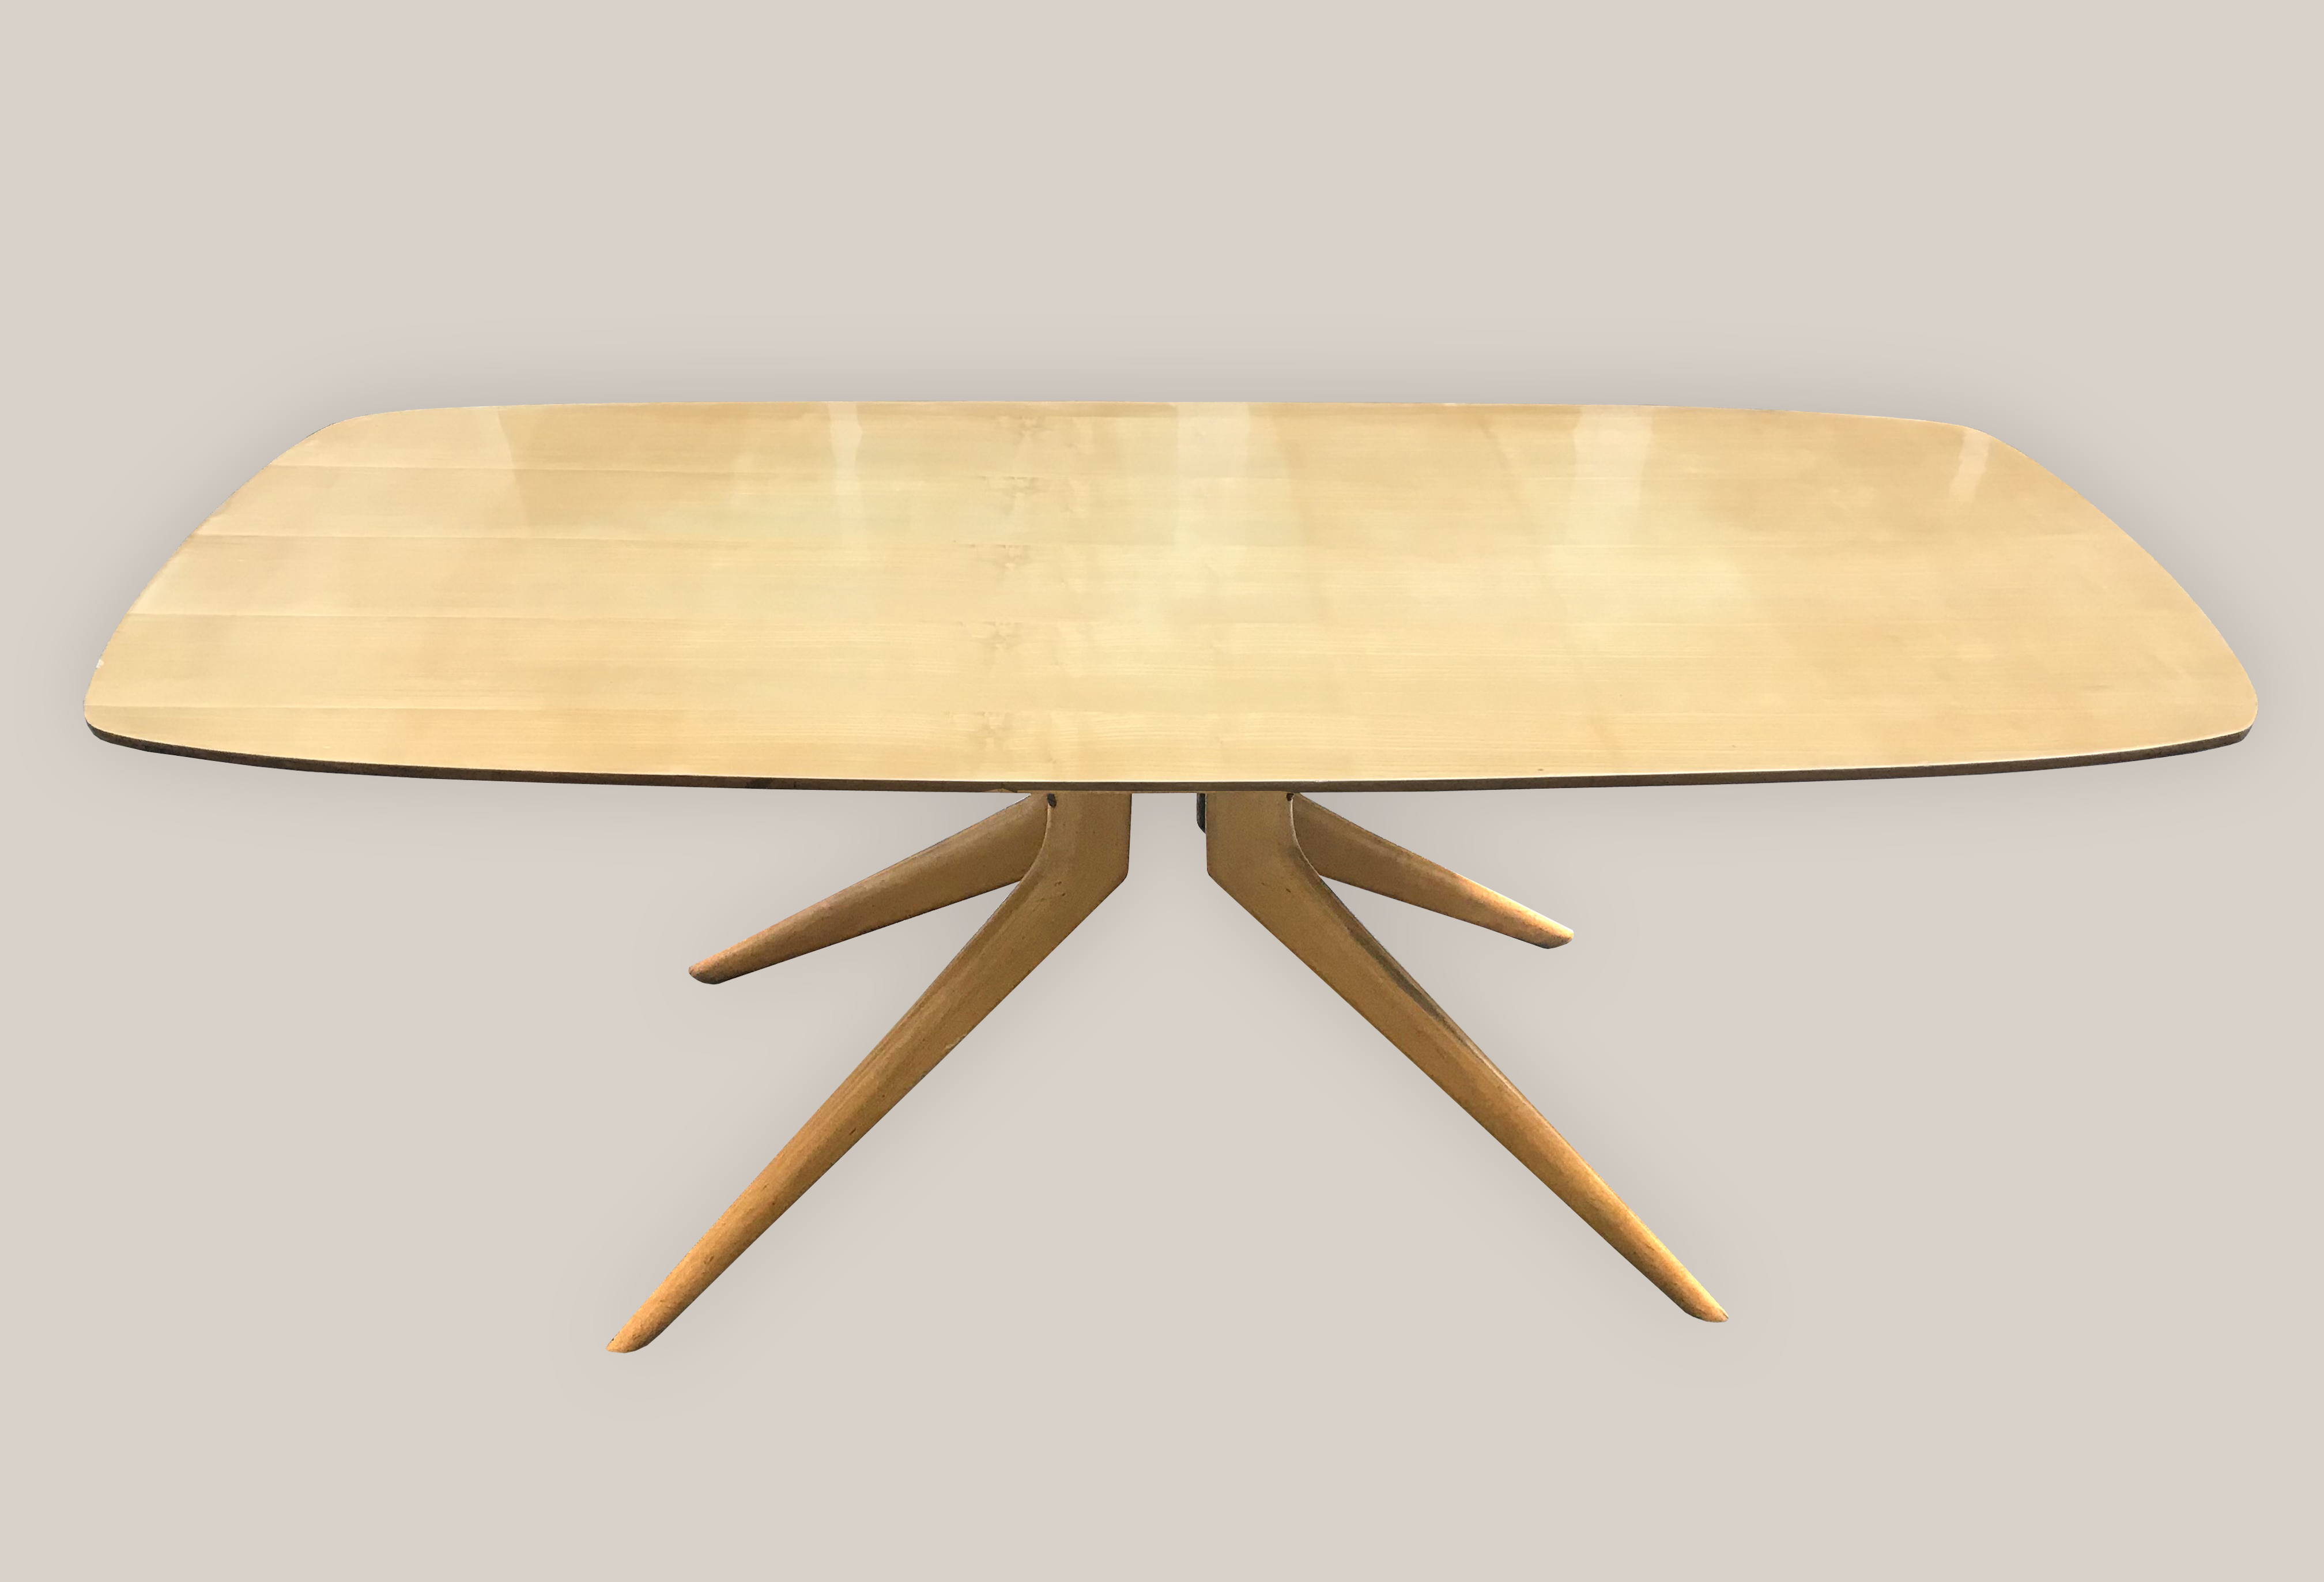 Table pied quadripode bois 1